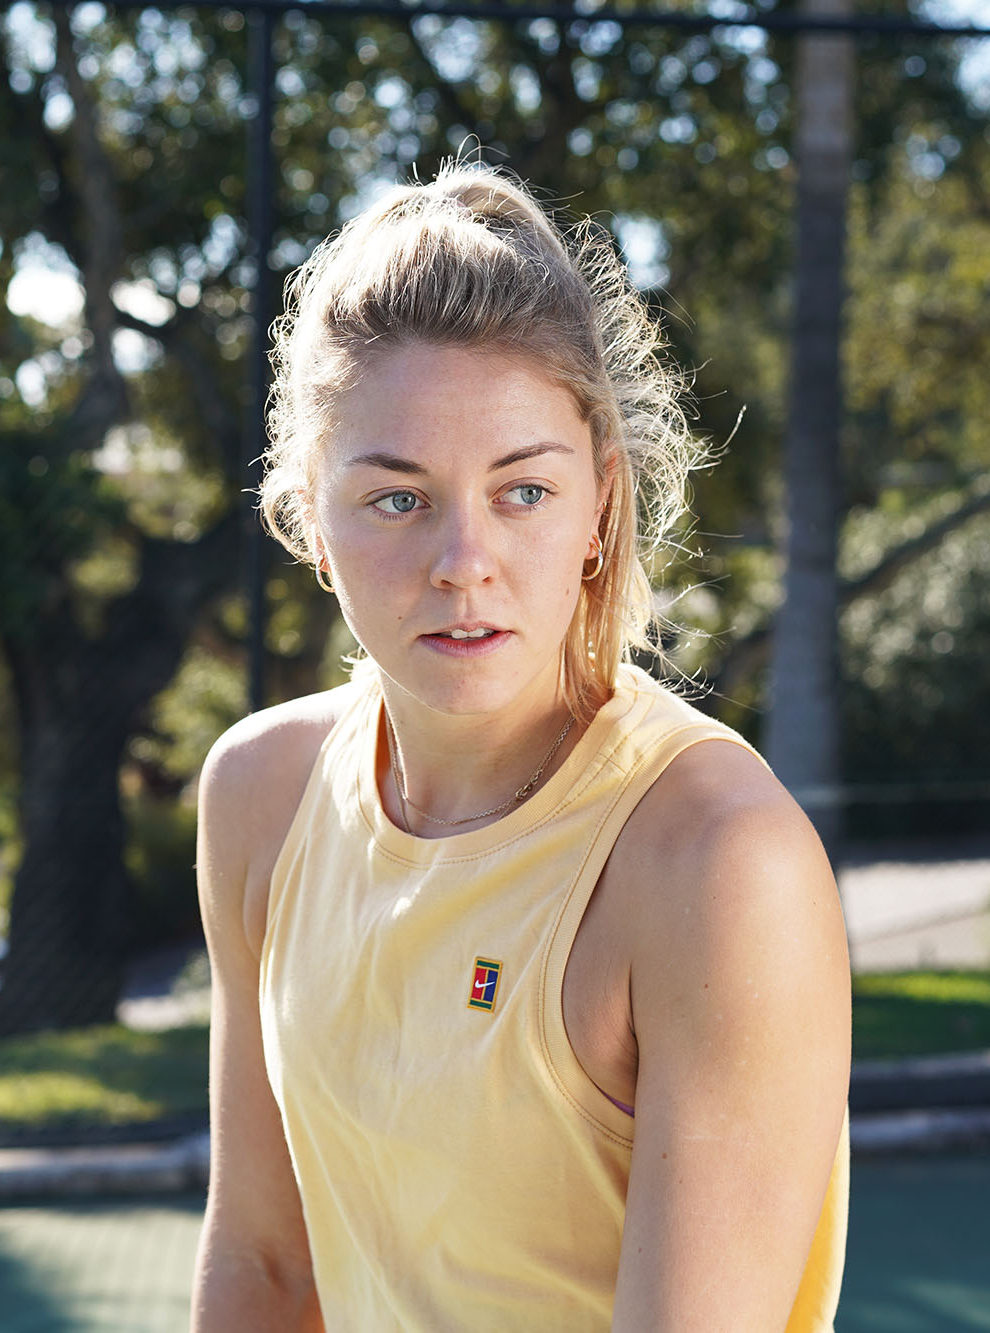 Carina Witthöft, Tennis player